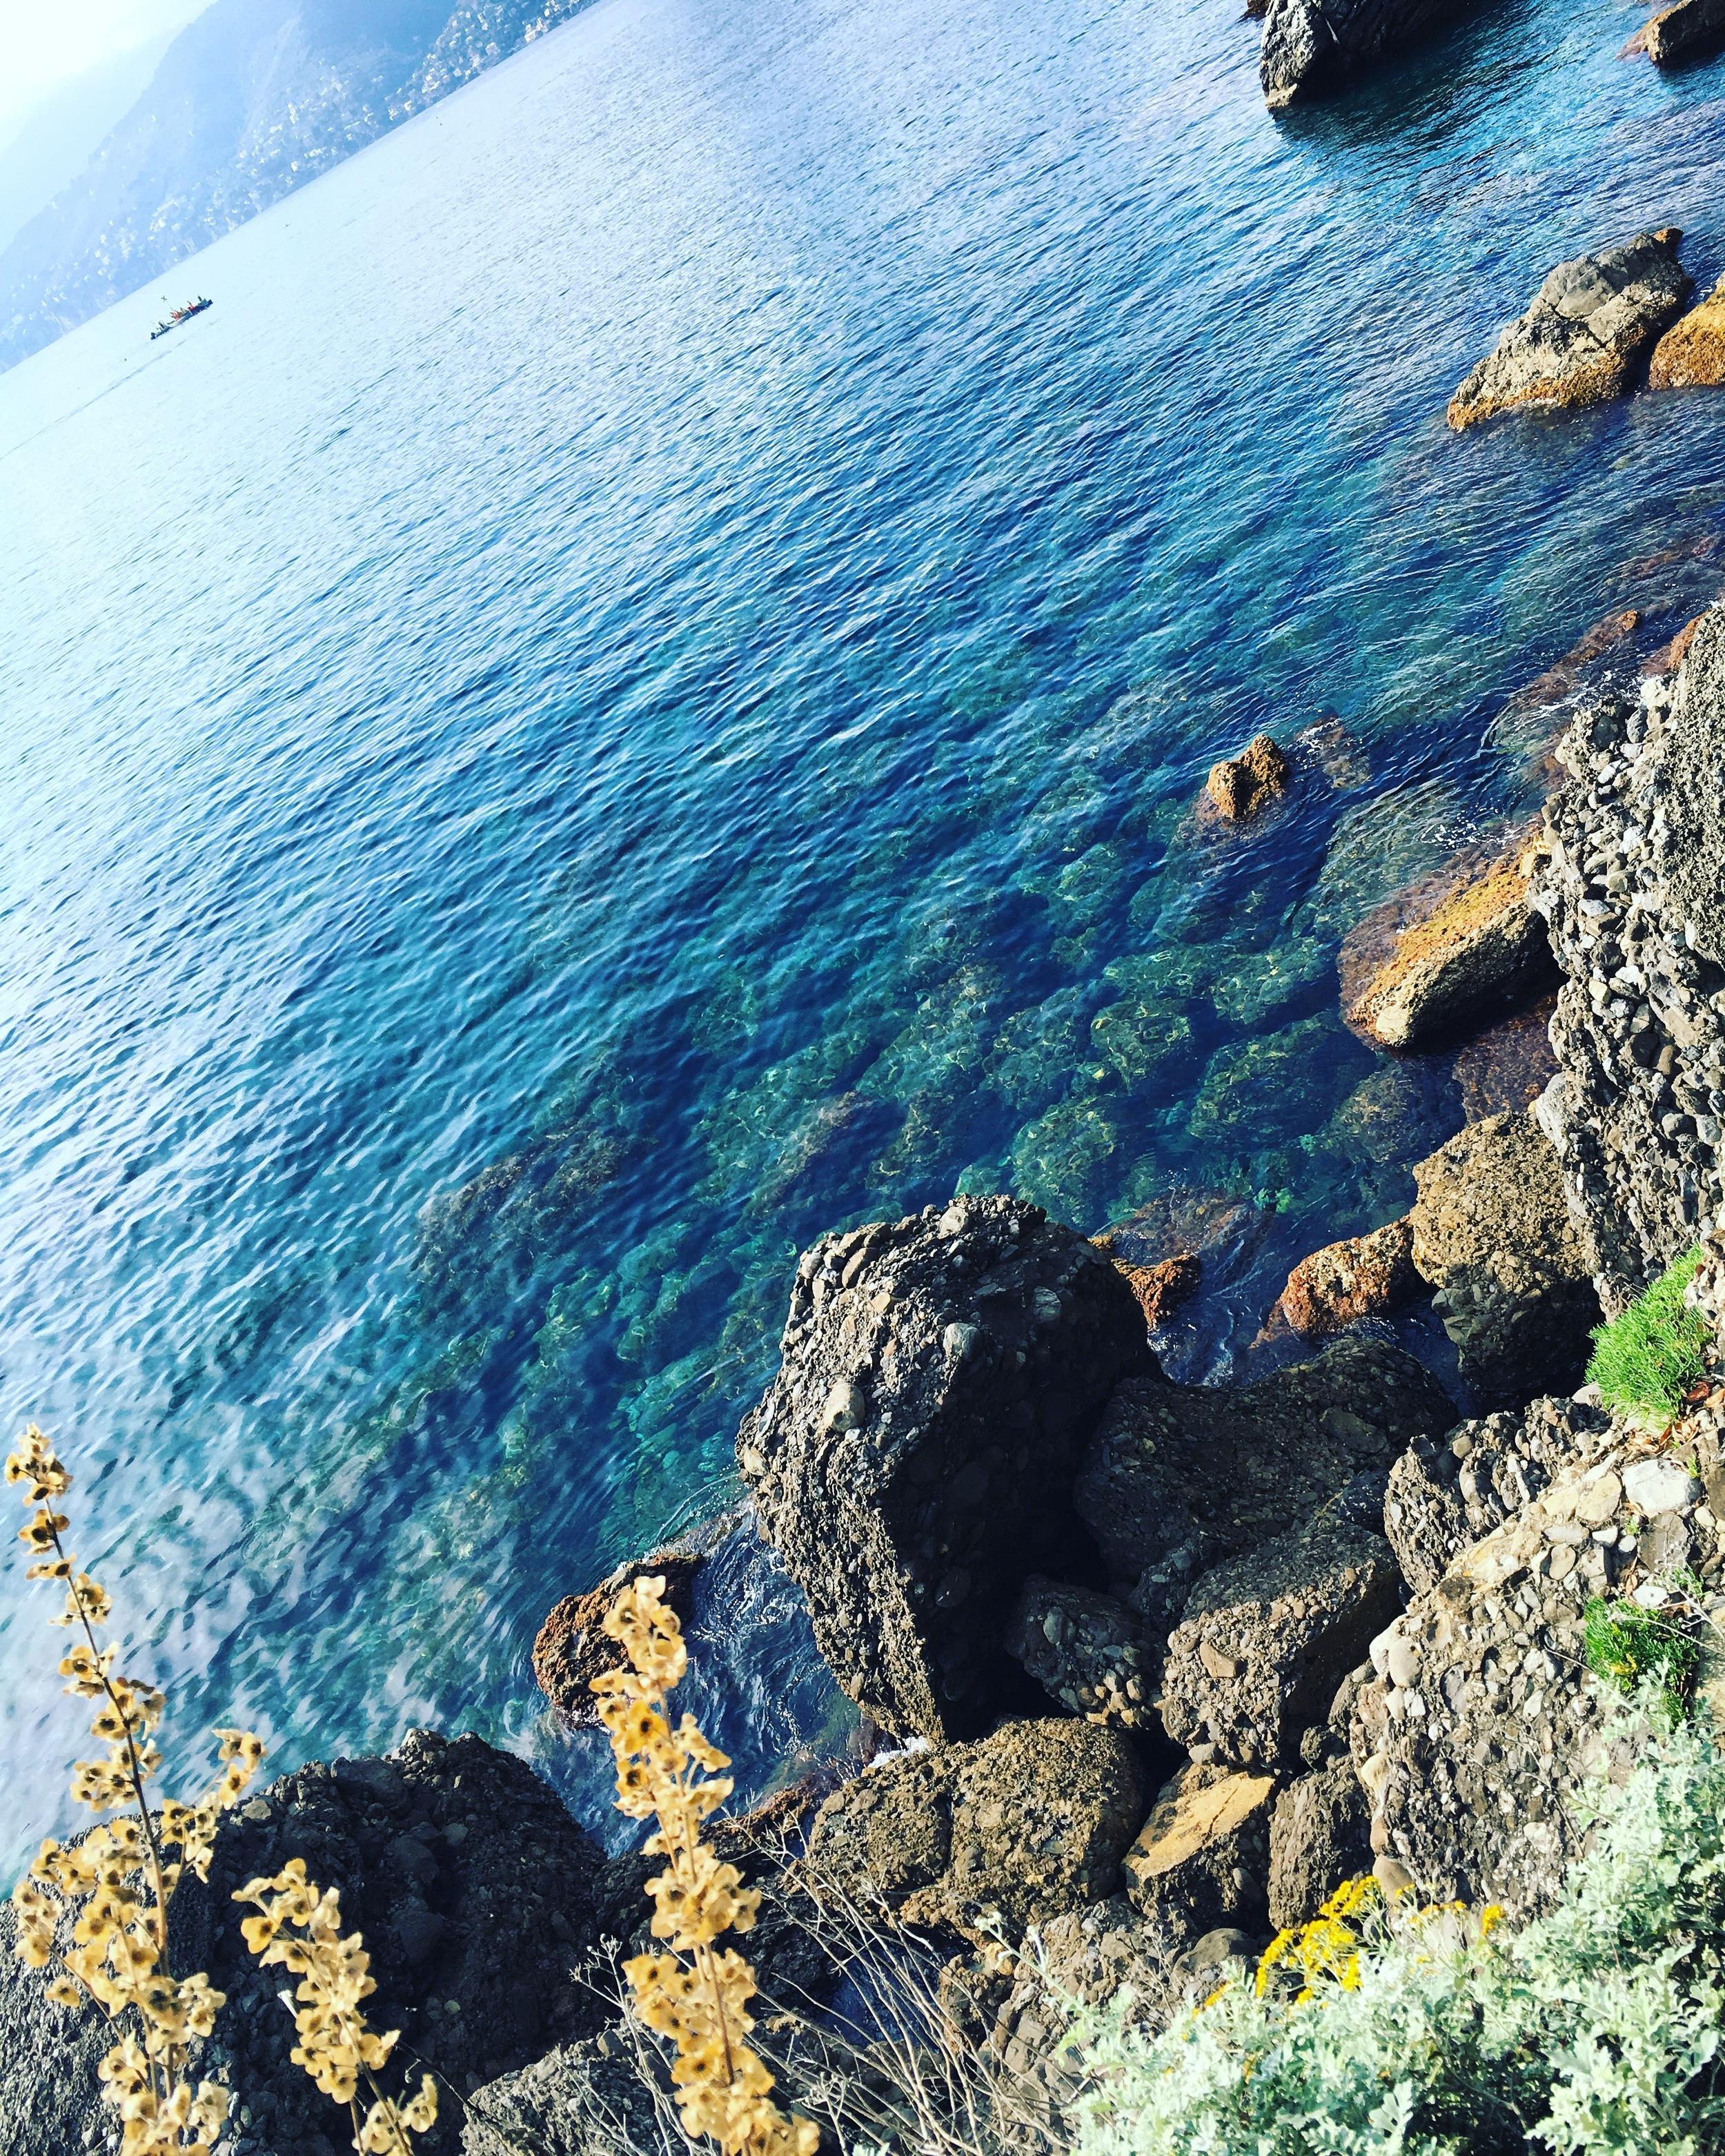 Reasons to visit Punta Chiappa Liguria Camogli